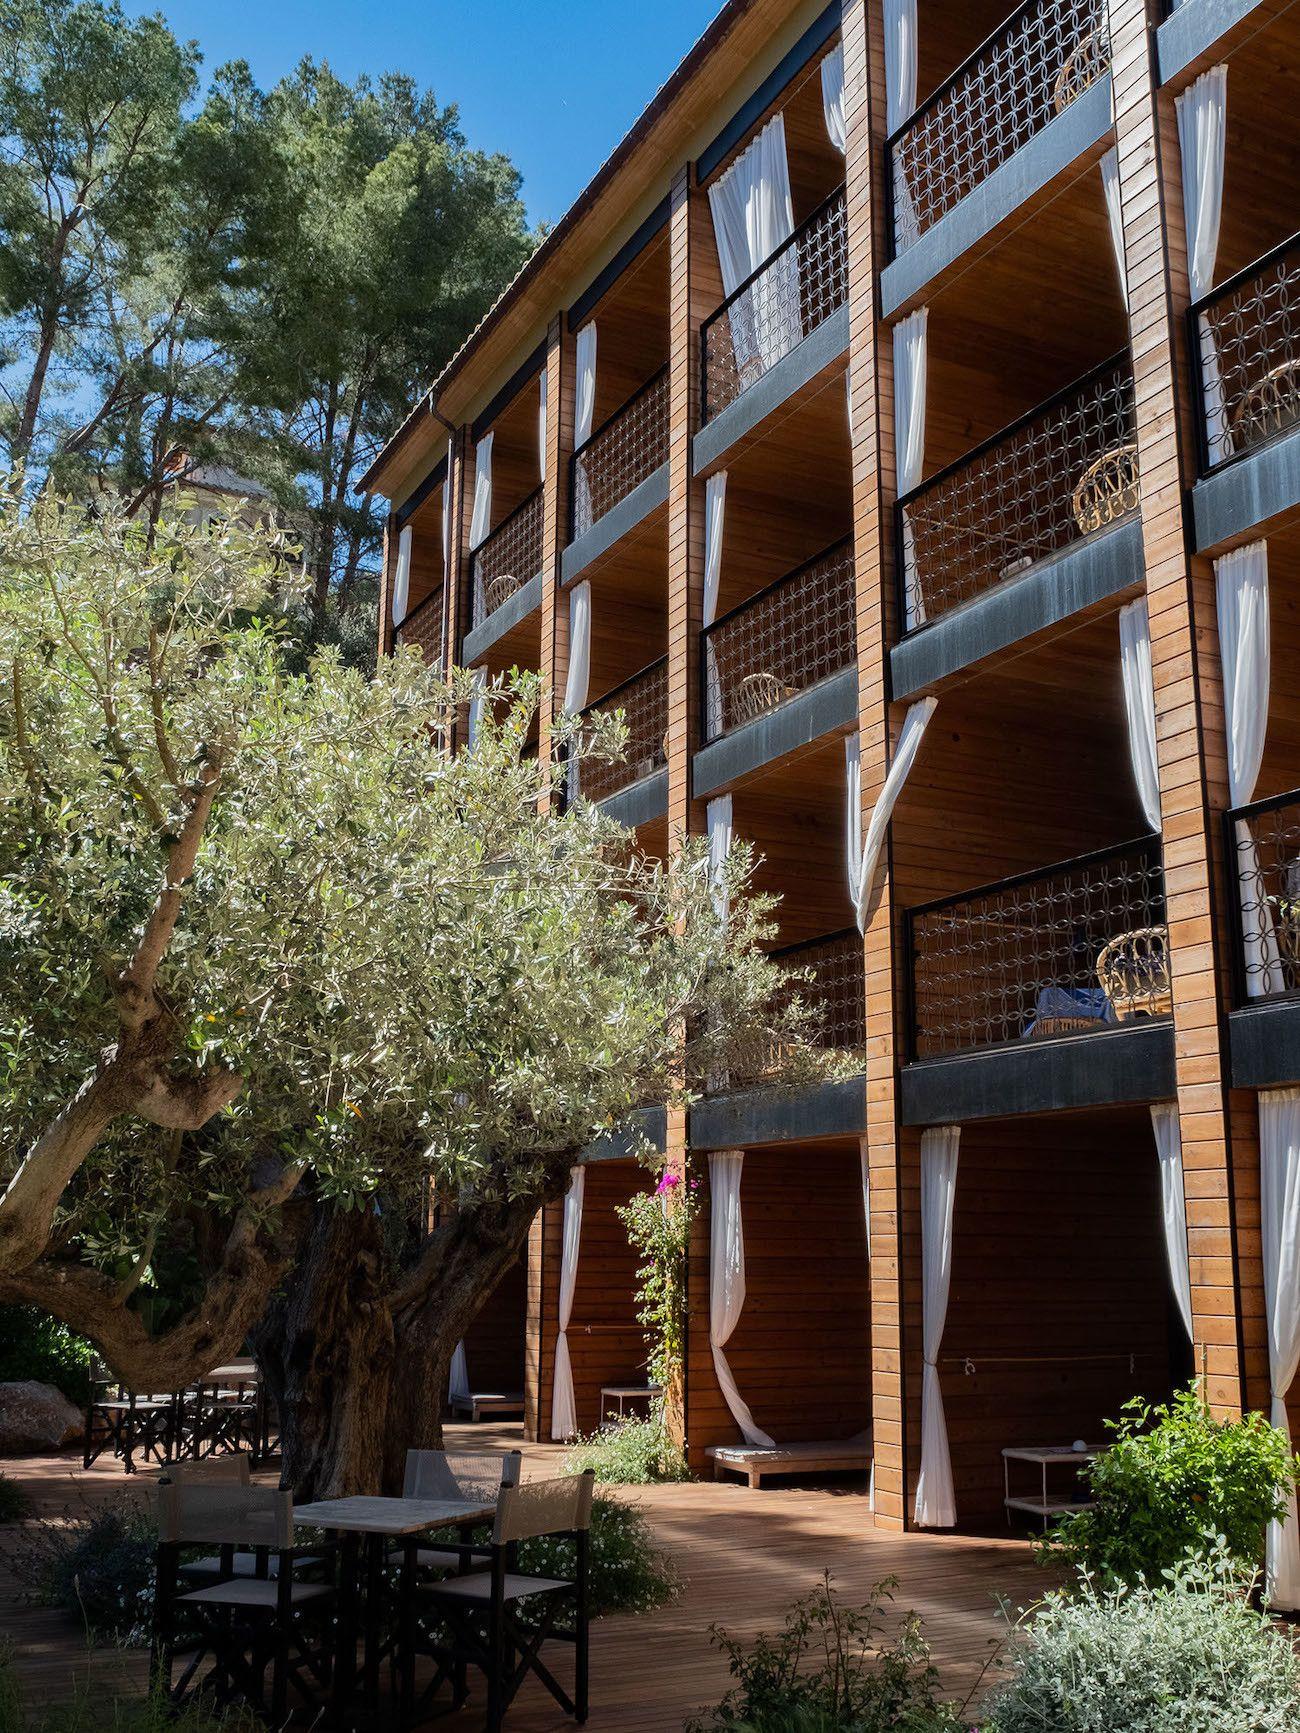 Foodblog About Fuel, Bikini Island & Mountain Hotels, Balkone